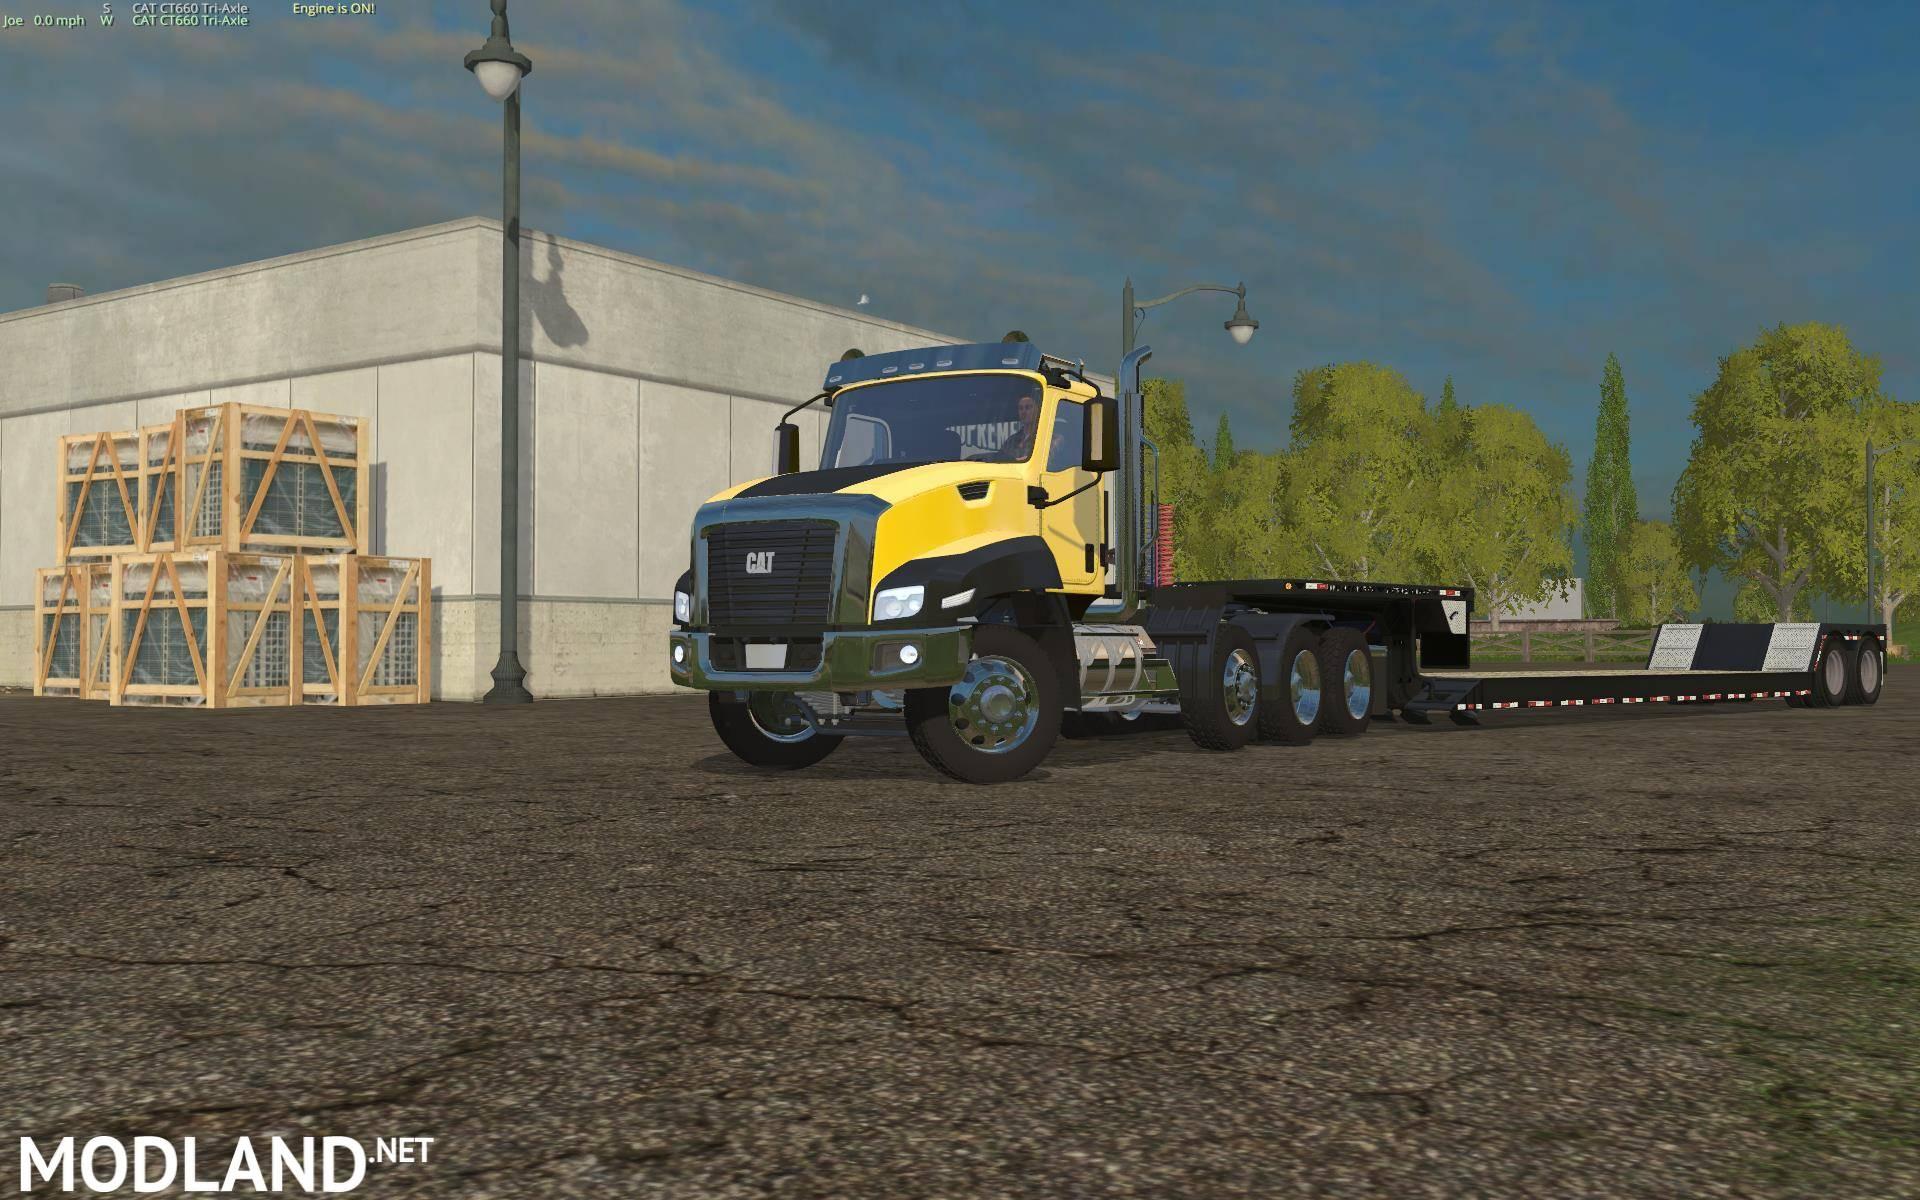 Cat Truck Mod v 3 0 mod for Farming Simulator 2015 / 15 | FS, LS